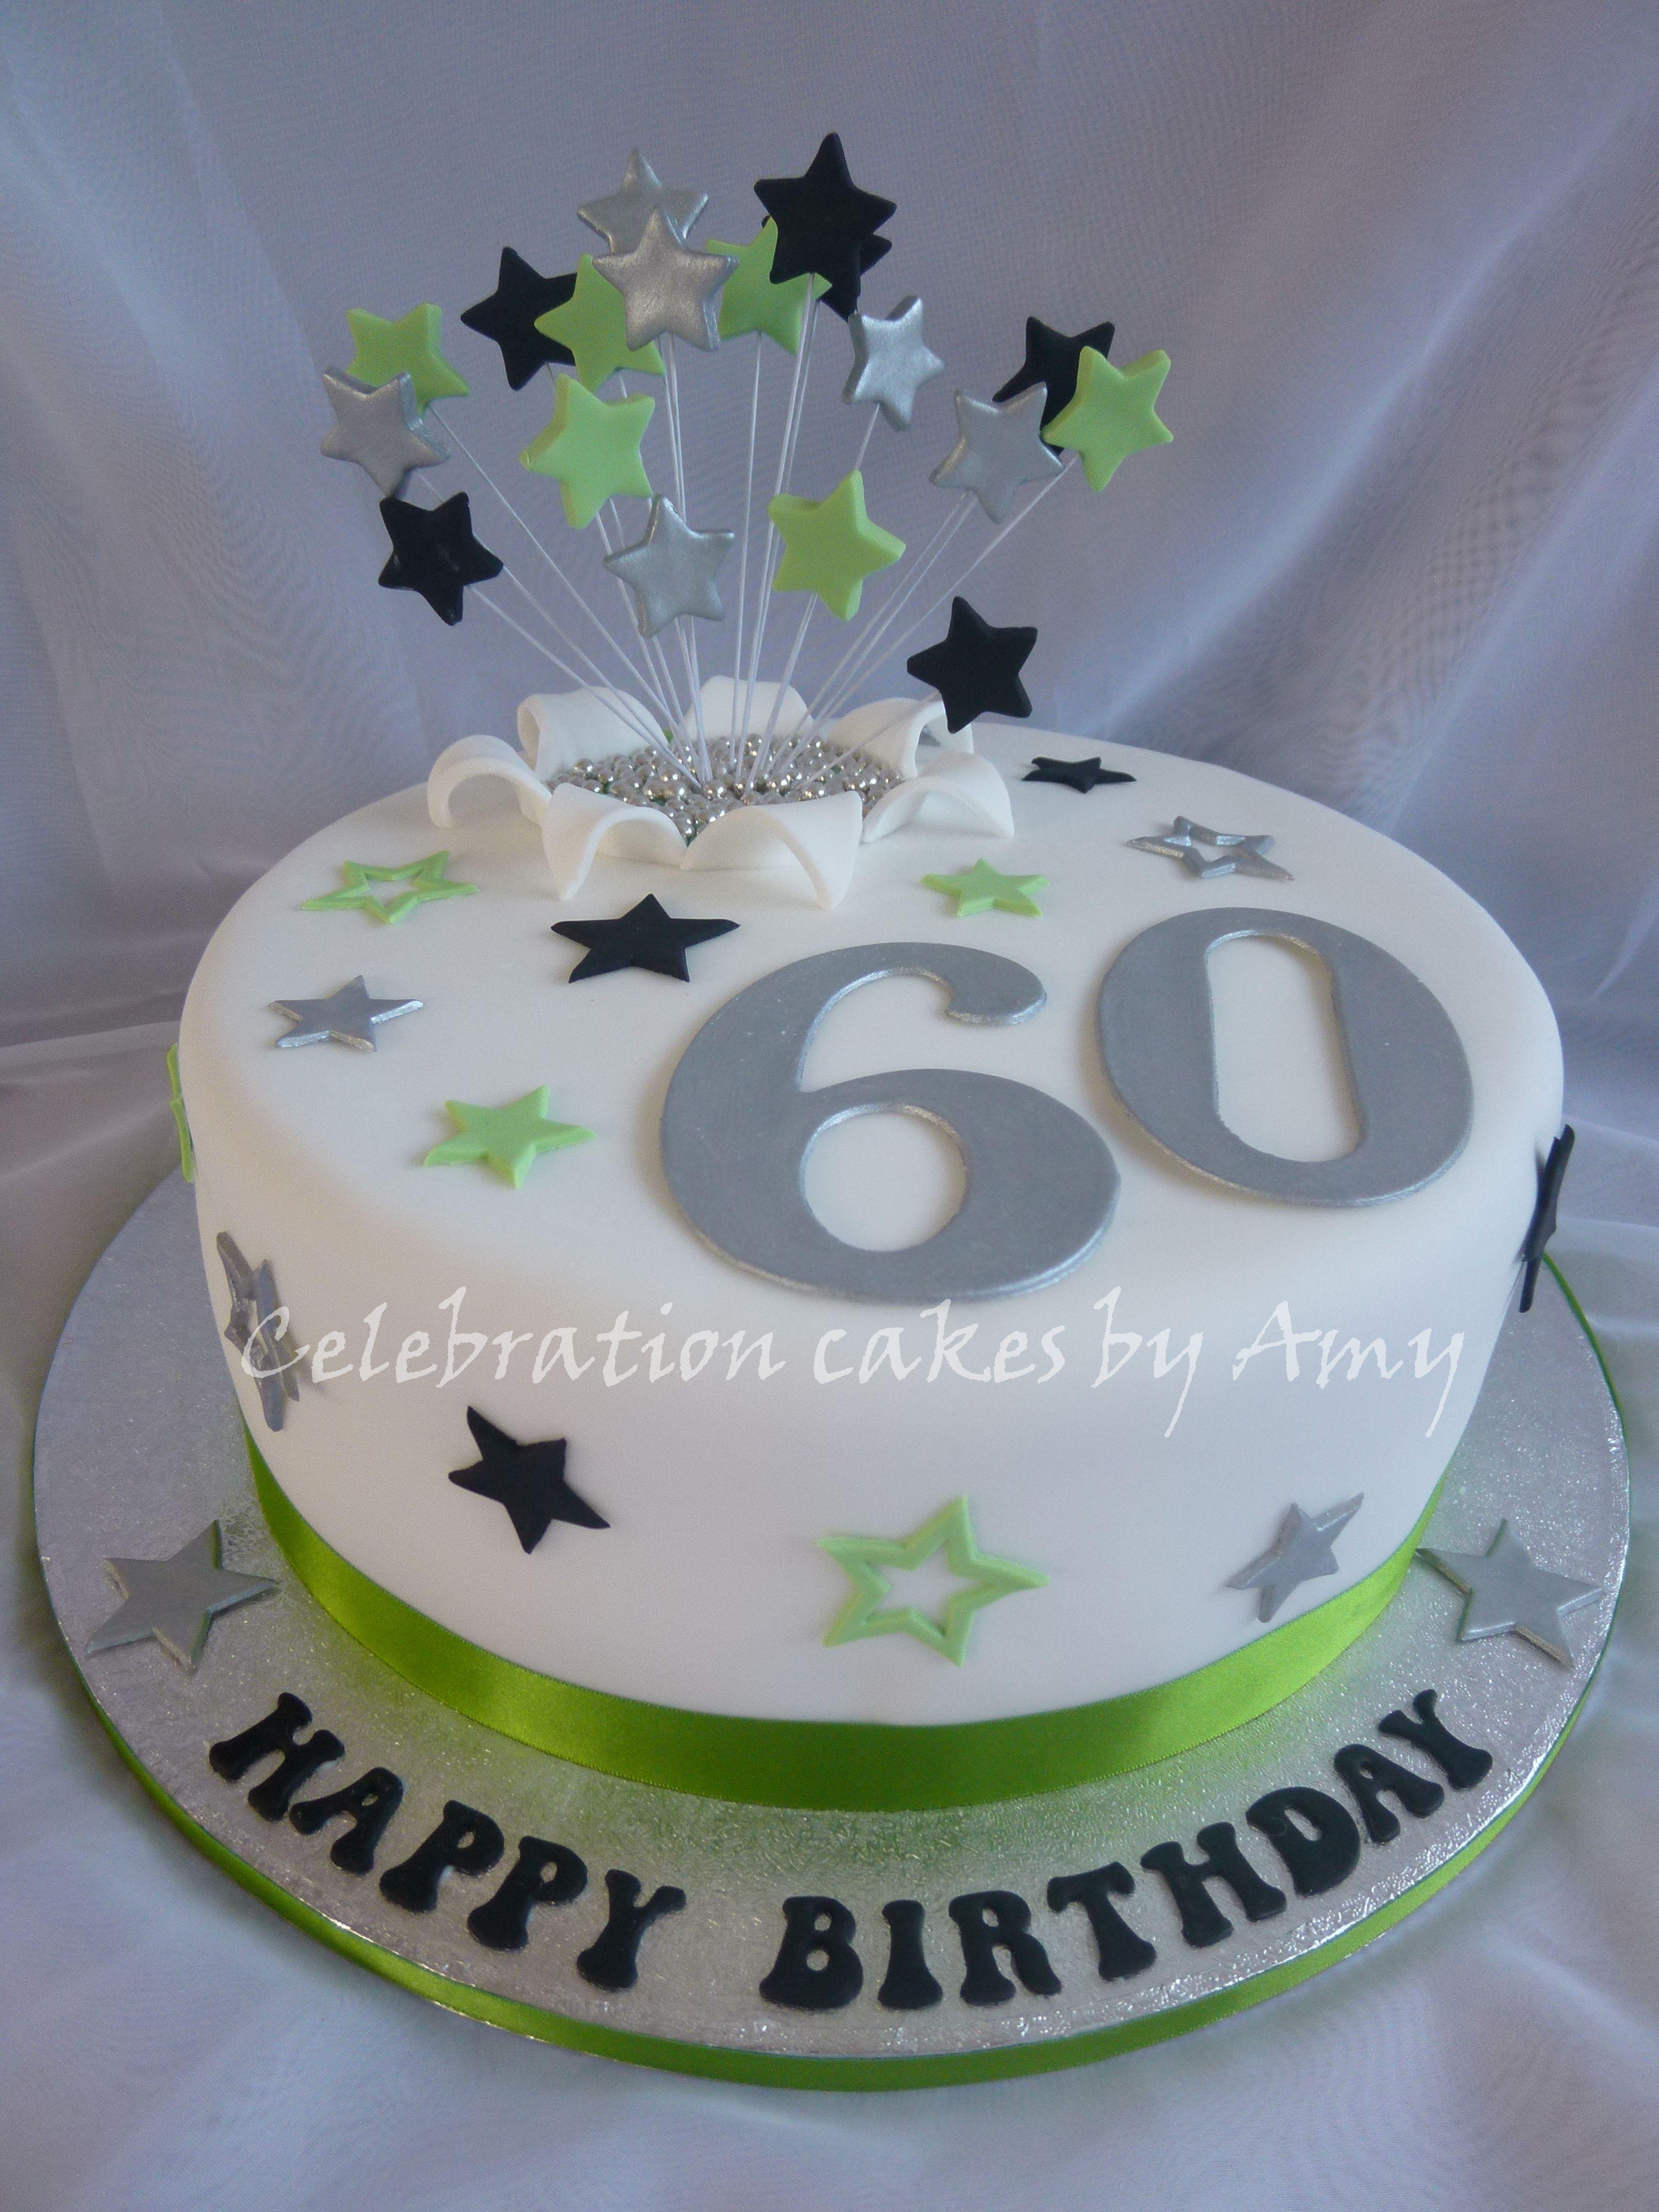 Male S 60th Birthday Cake